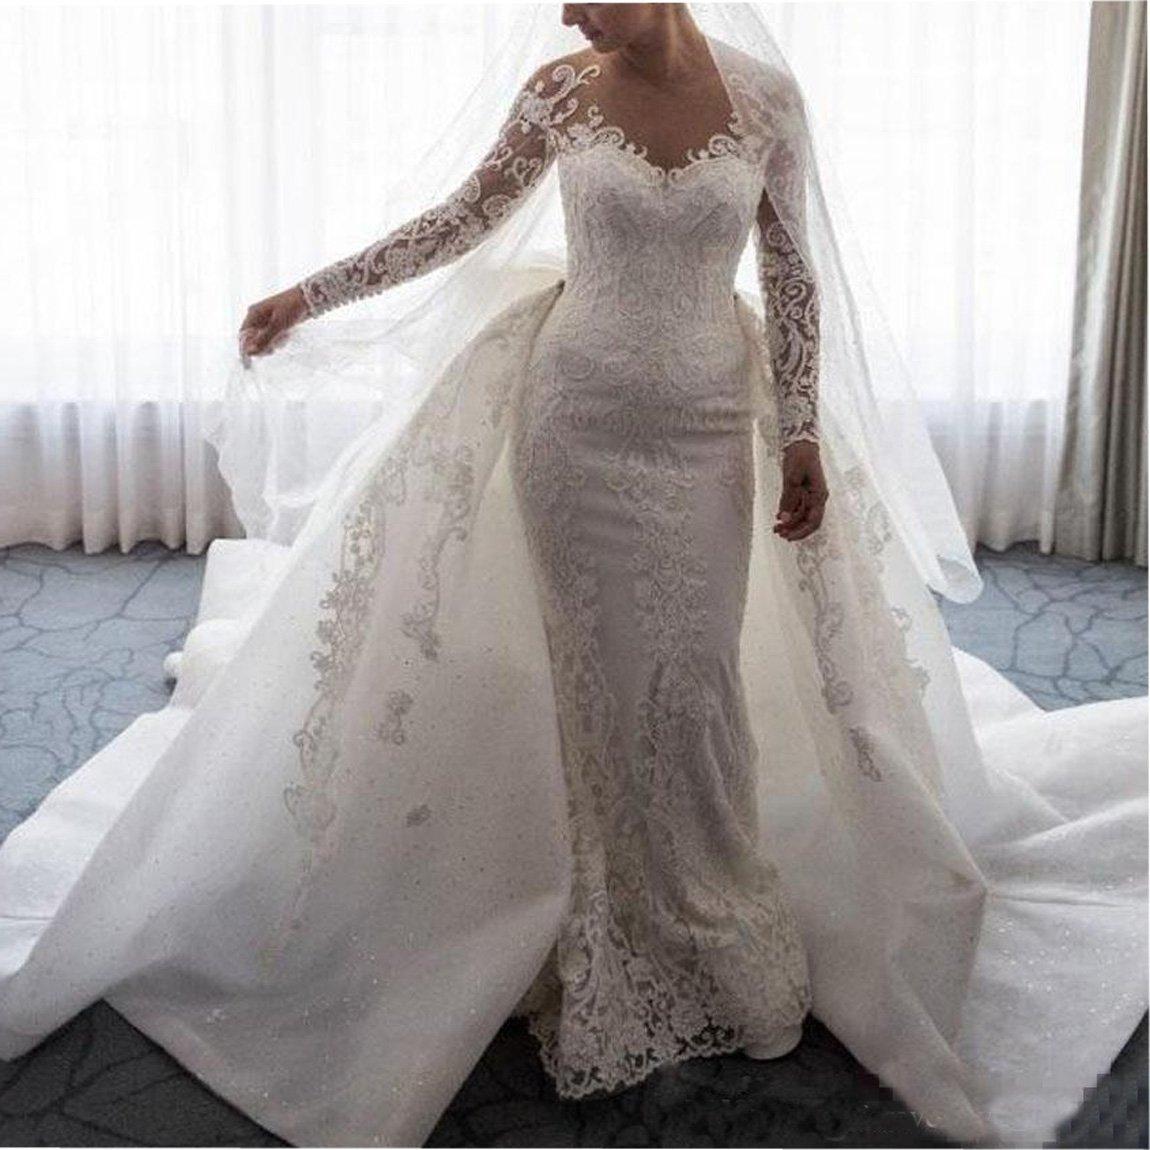 Ainisha Womens Elegant Long Sleeves Mermaid Wedding Dress Ball Gown Wedding Gown Lace Detachable Train Bridal Gown